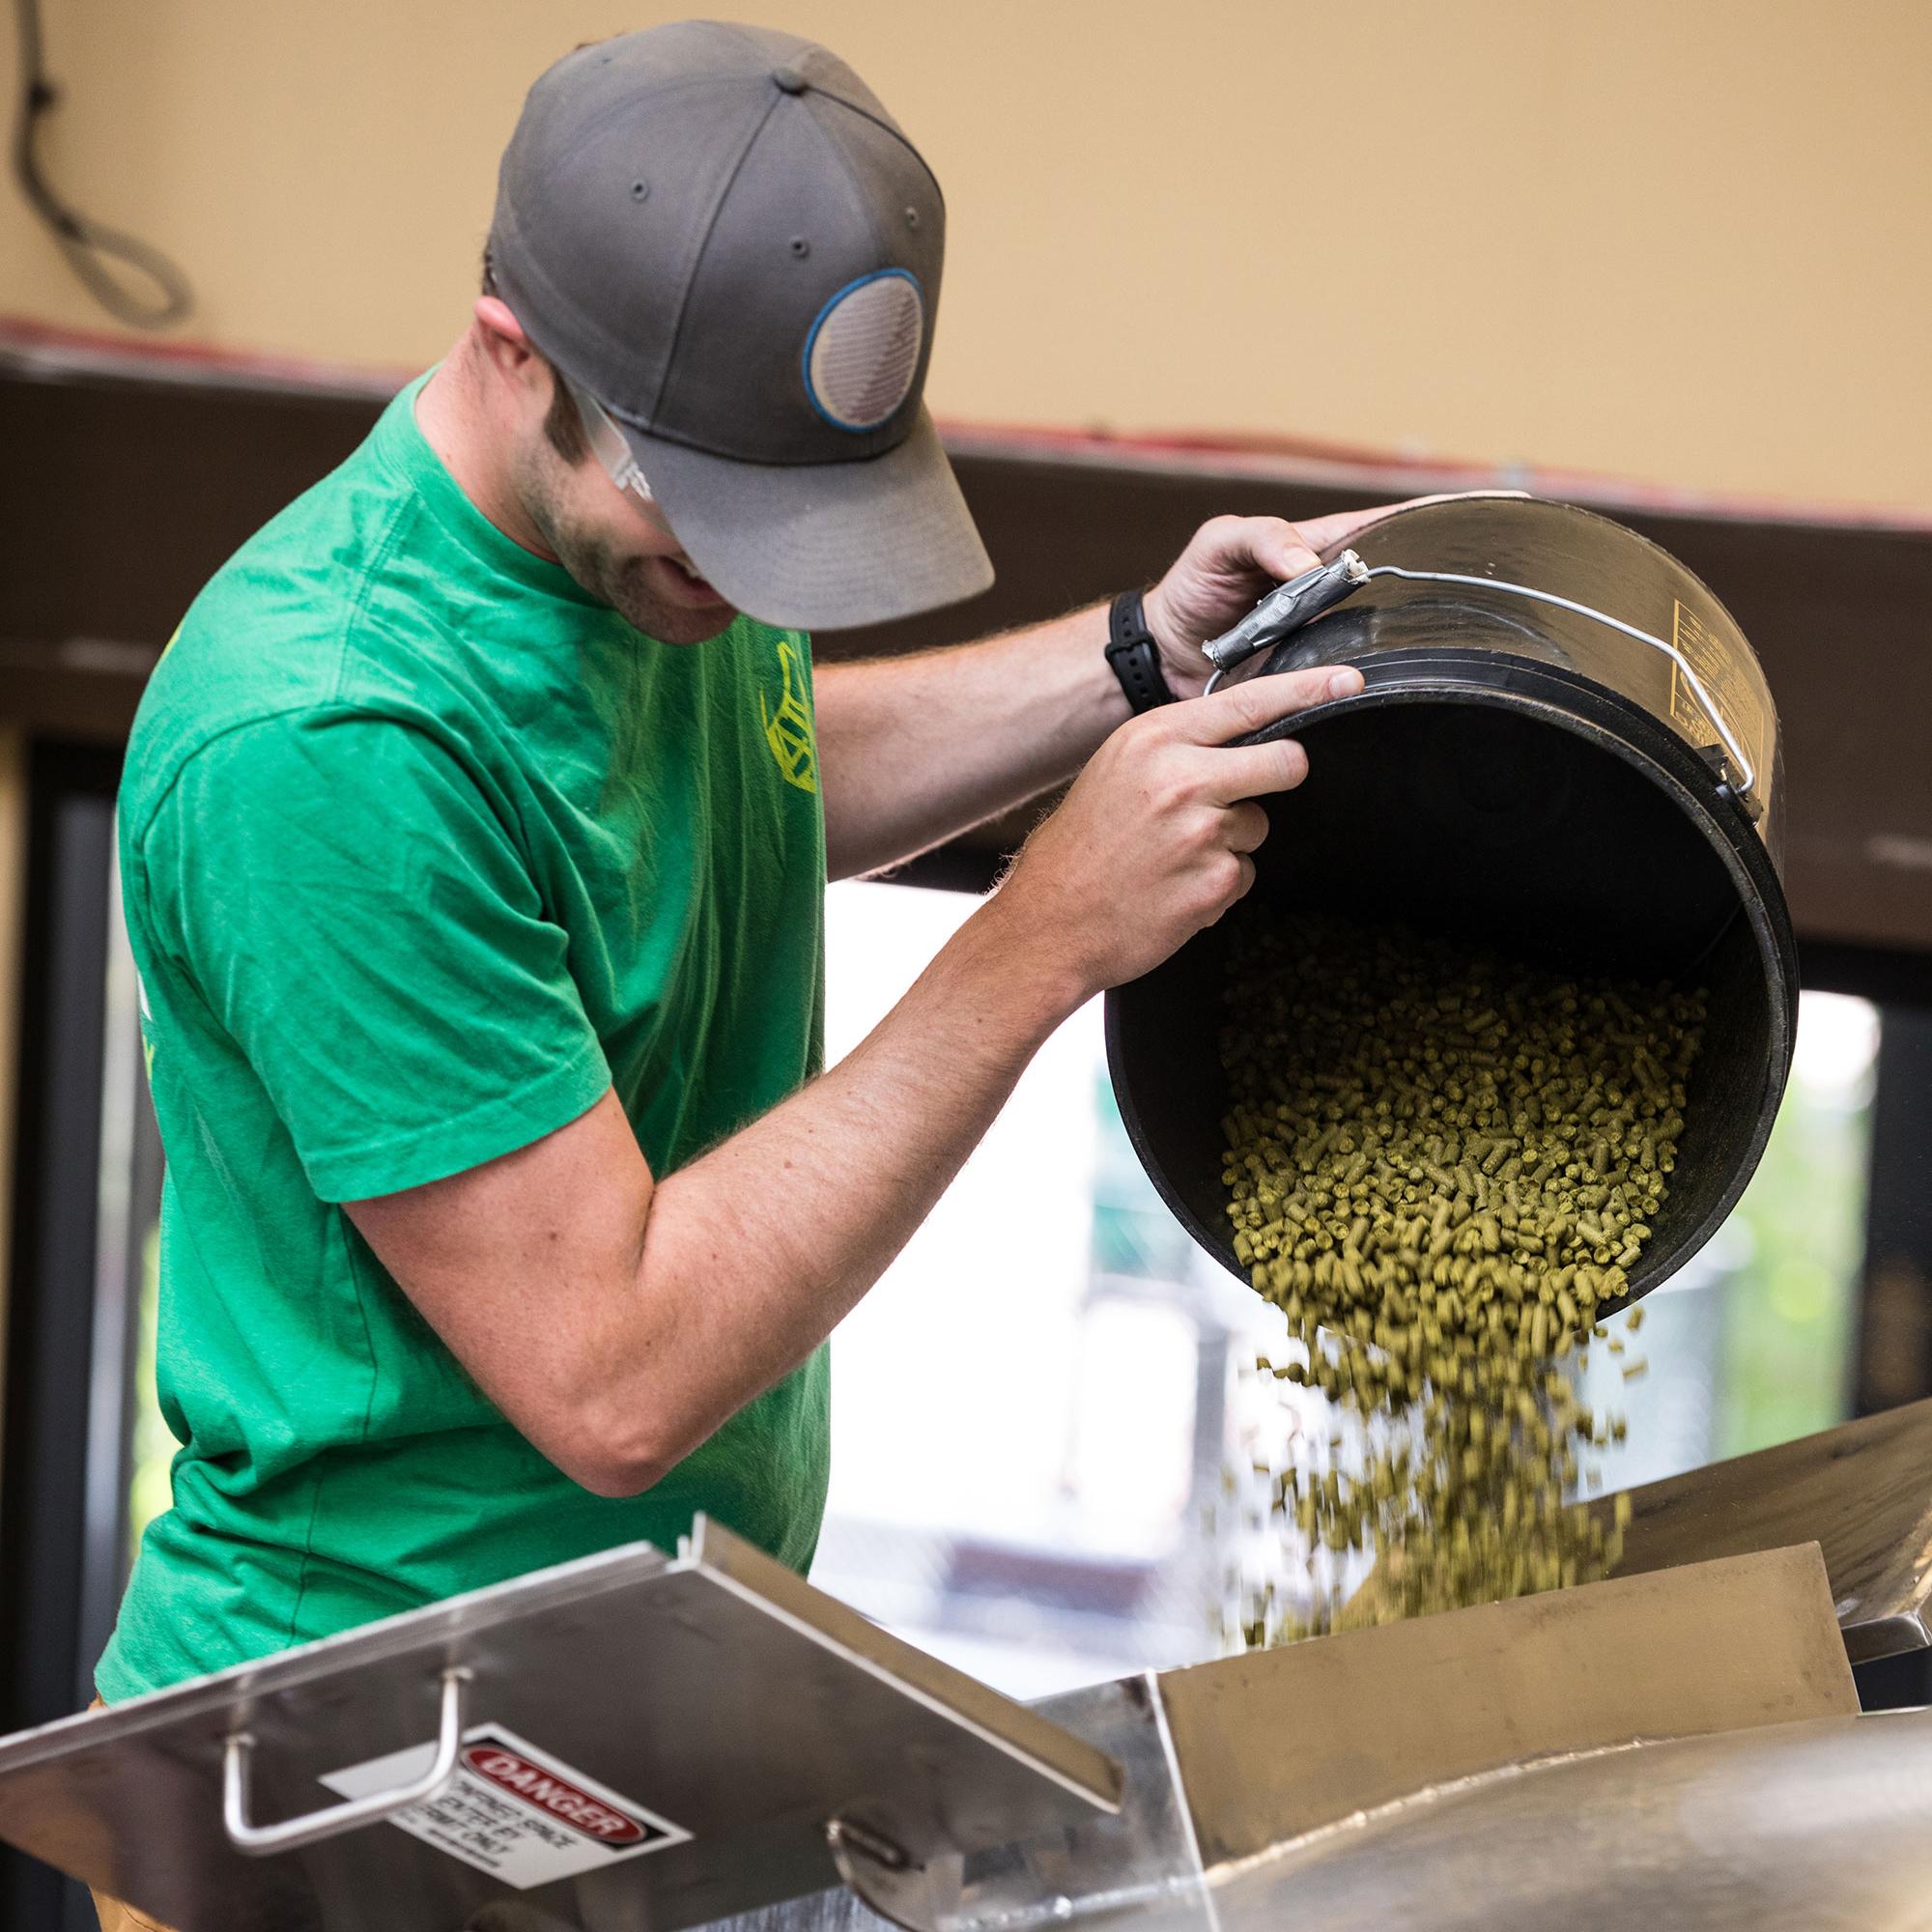 Man dumping bucket of hops into a machine